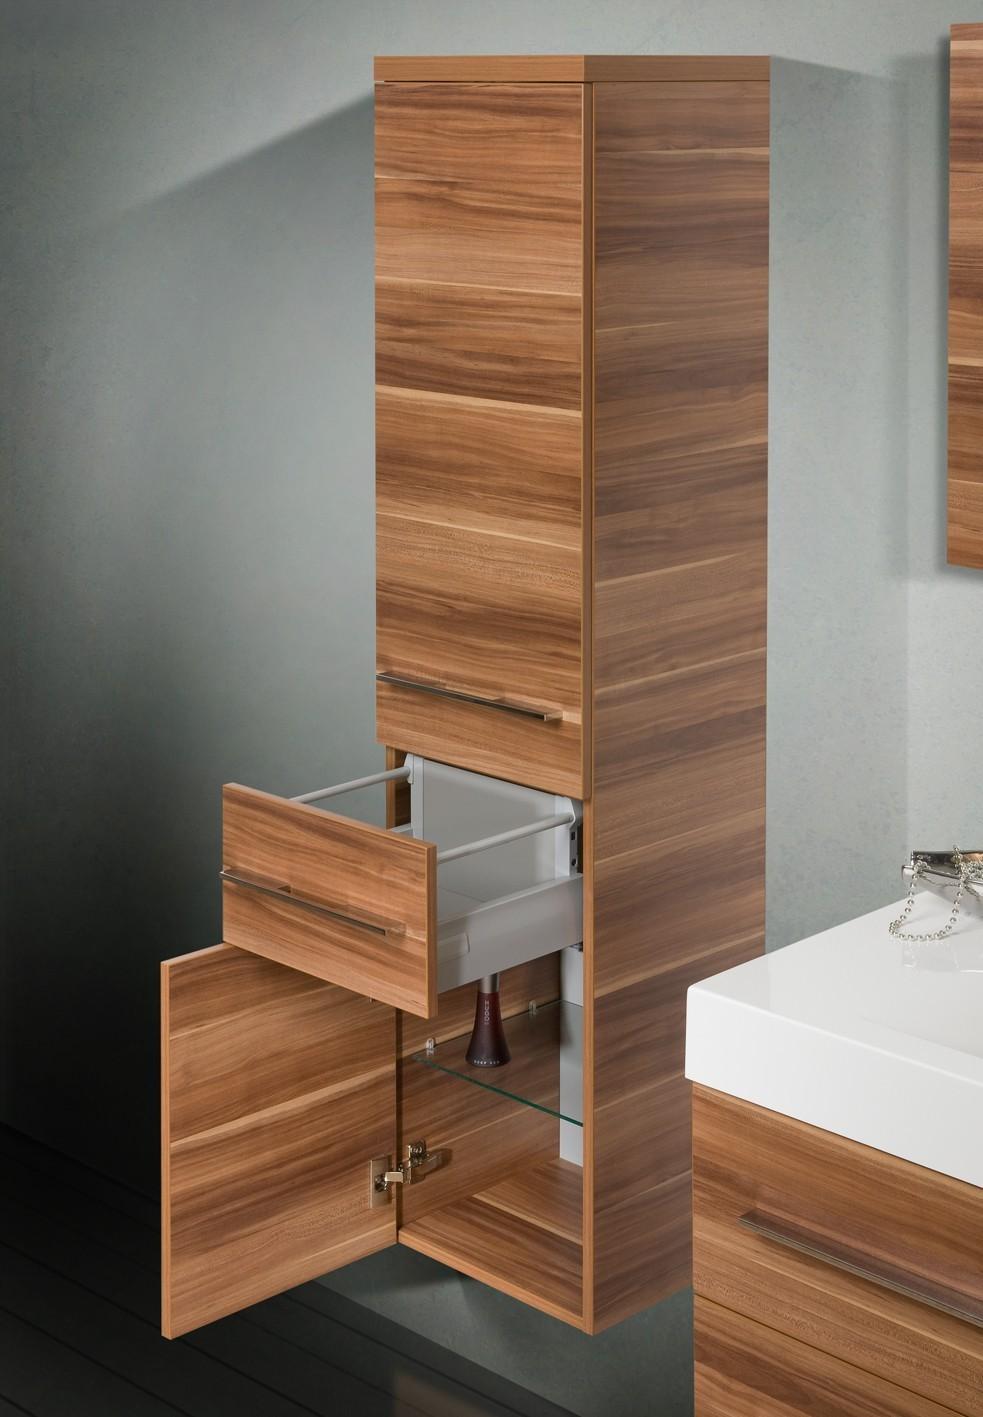 Design badm bel set doppelwaschtisch 120 waschbecken for Badmobel set doppelwaschtisch